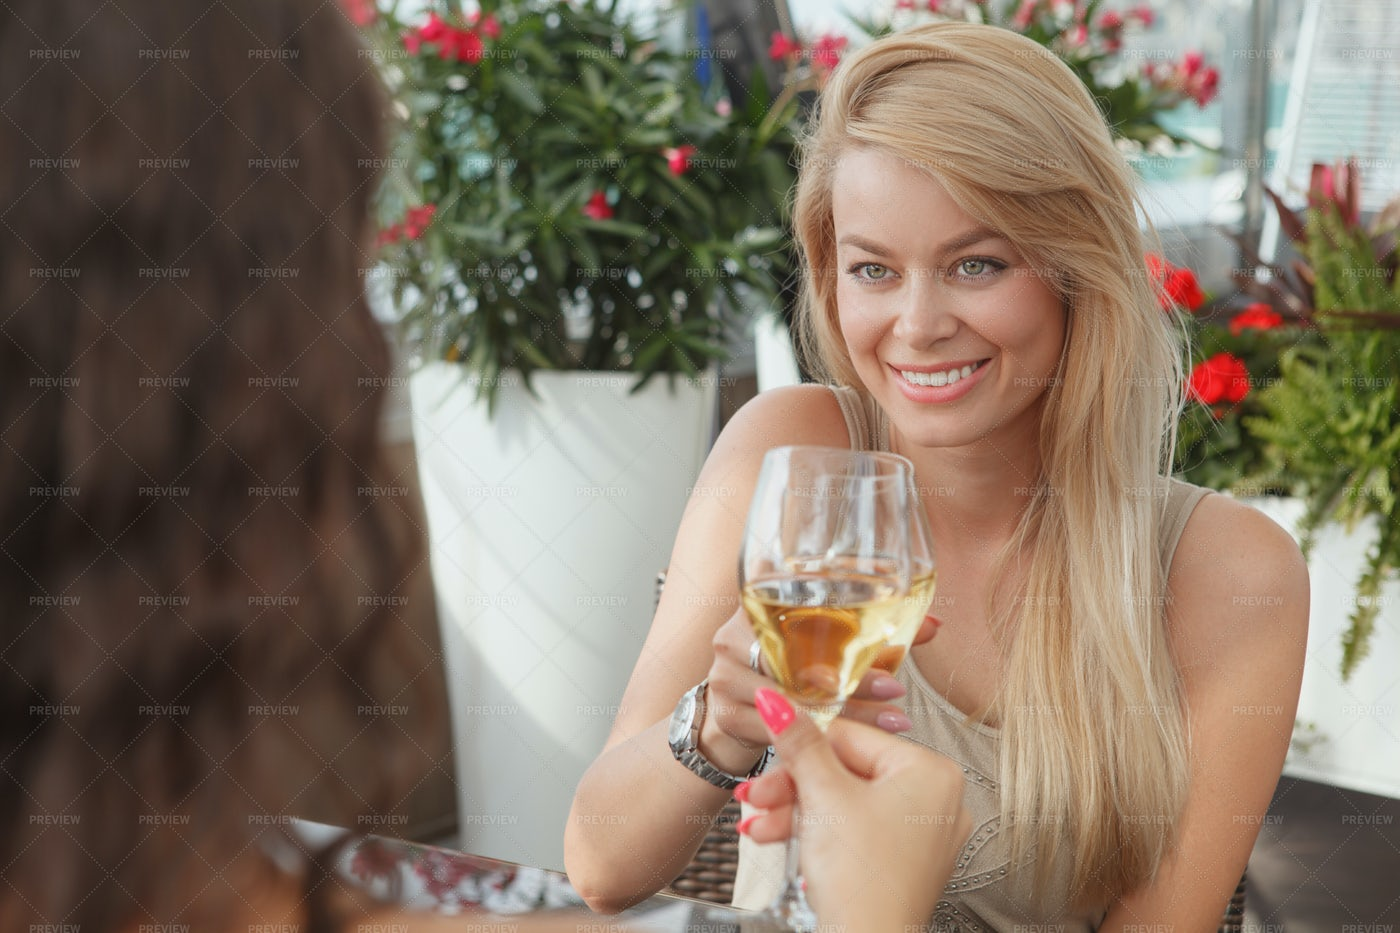 Female Friends Enjoying Drinks: Stock Photos